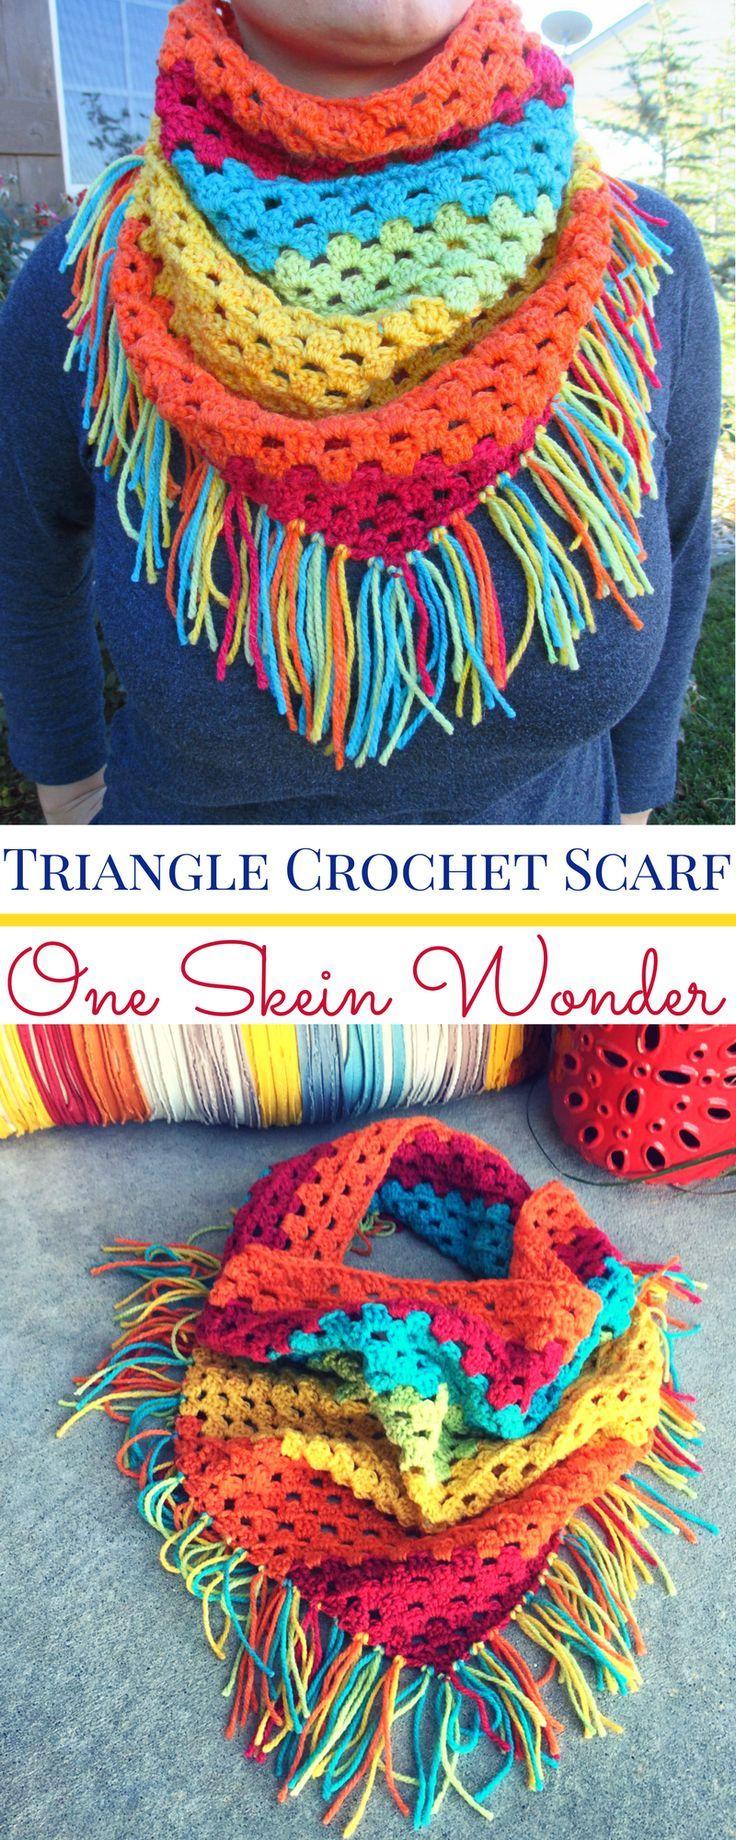 Triangle Crochet Scarf with Fringe (Using Caron Cake Yarn) | Chal de ...